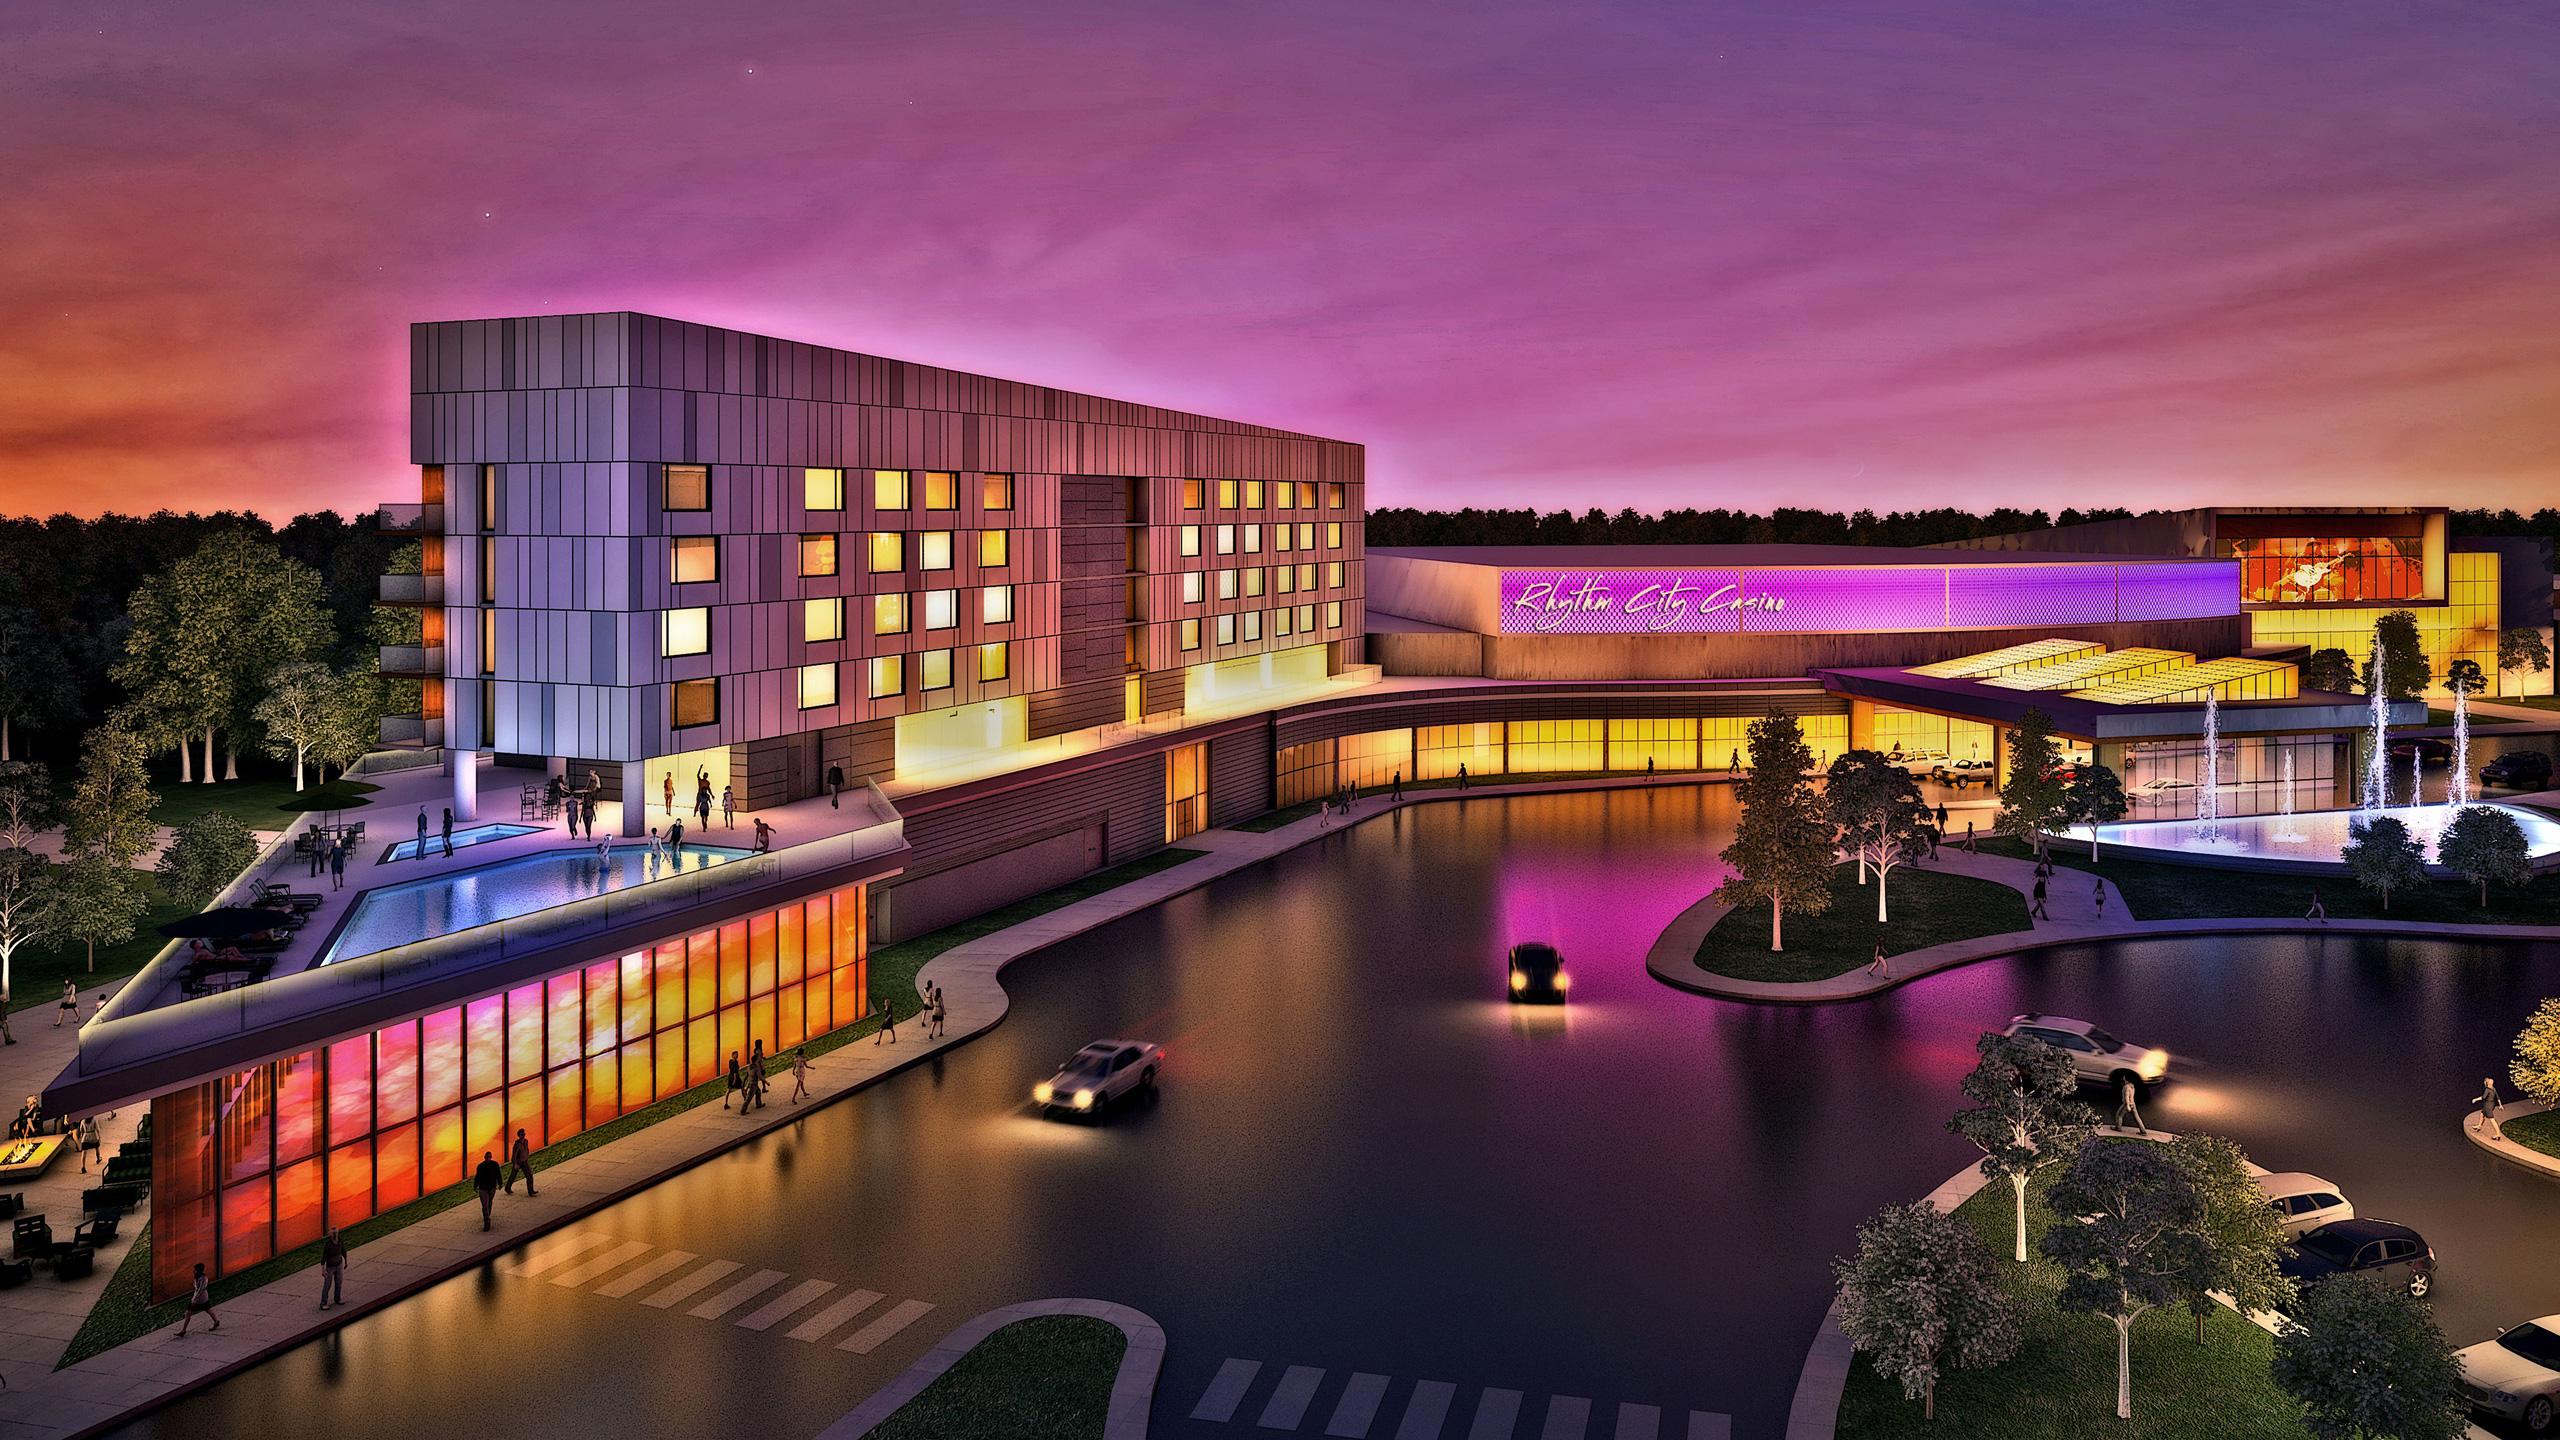 Moline illinois riverboat casino ameristar casino st charles address